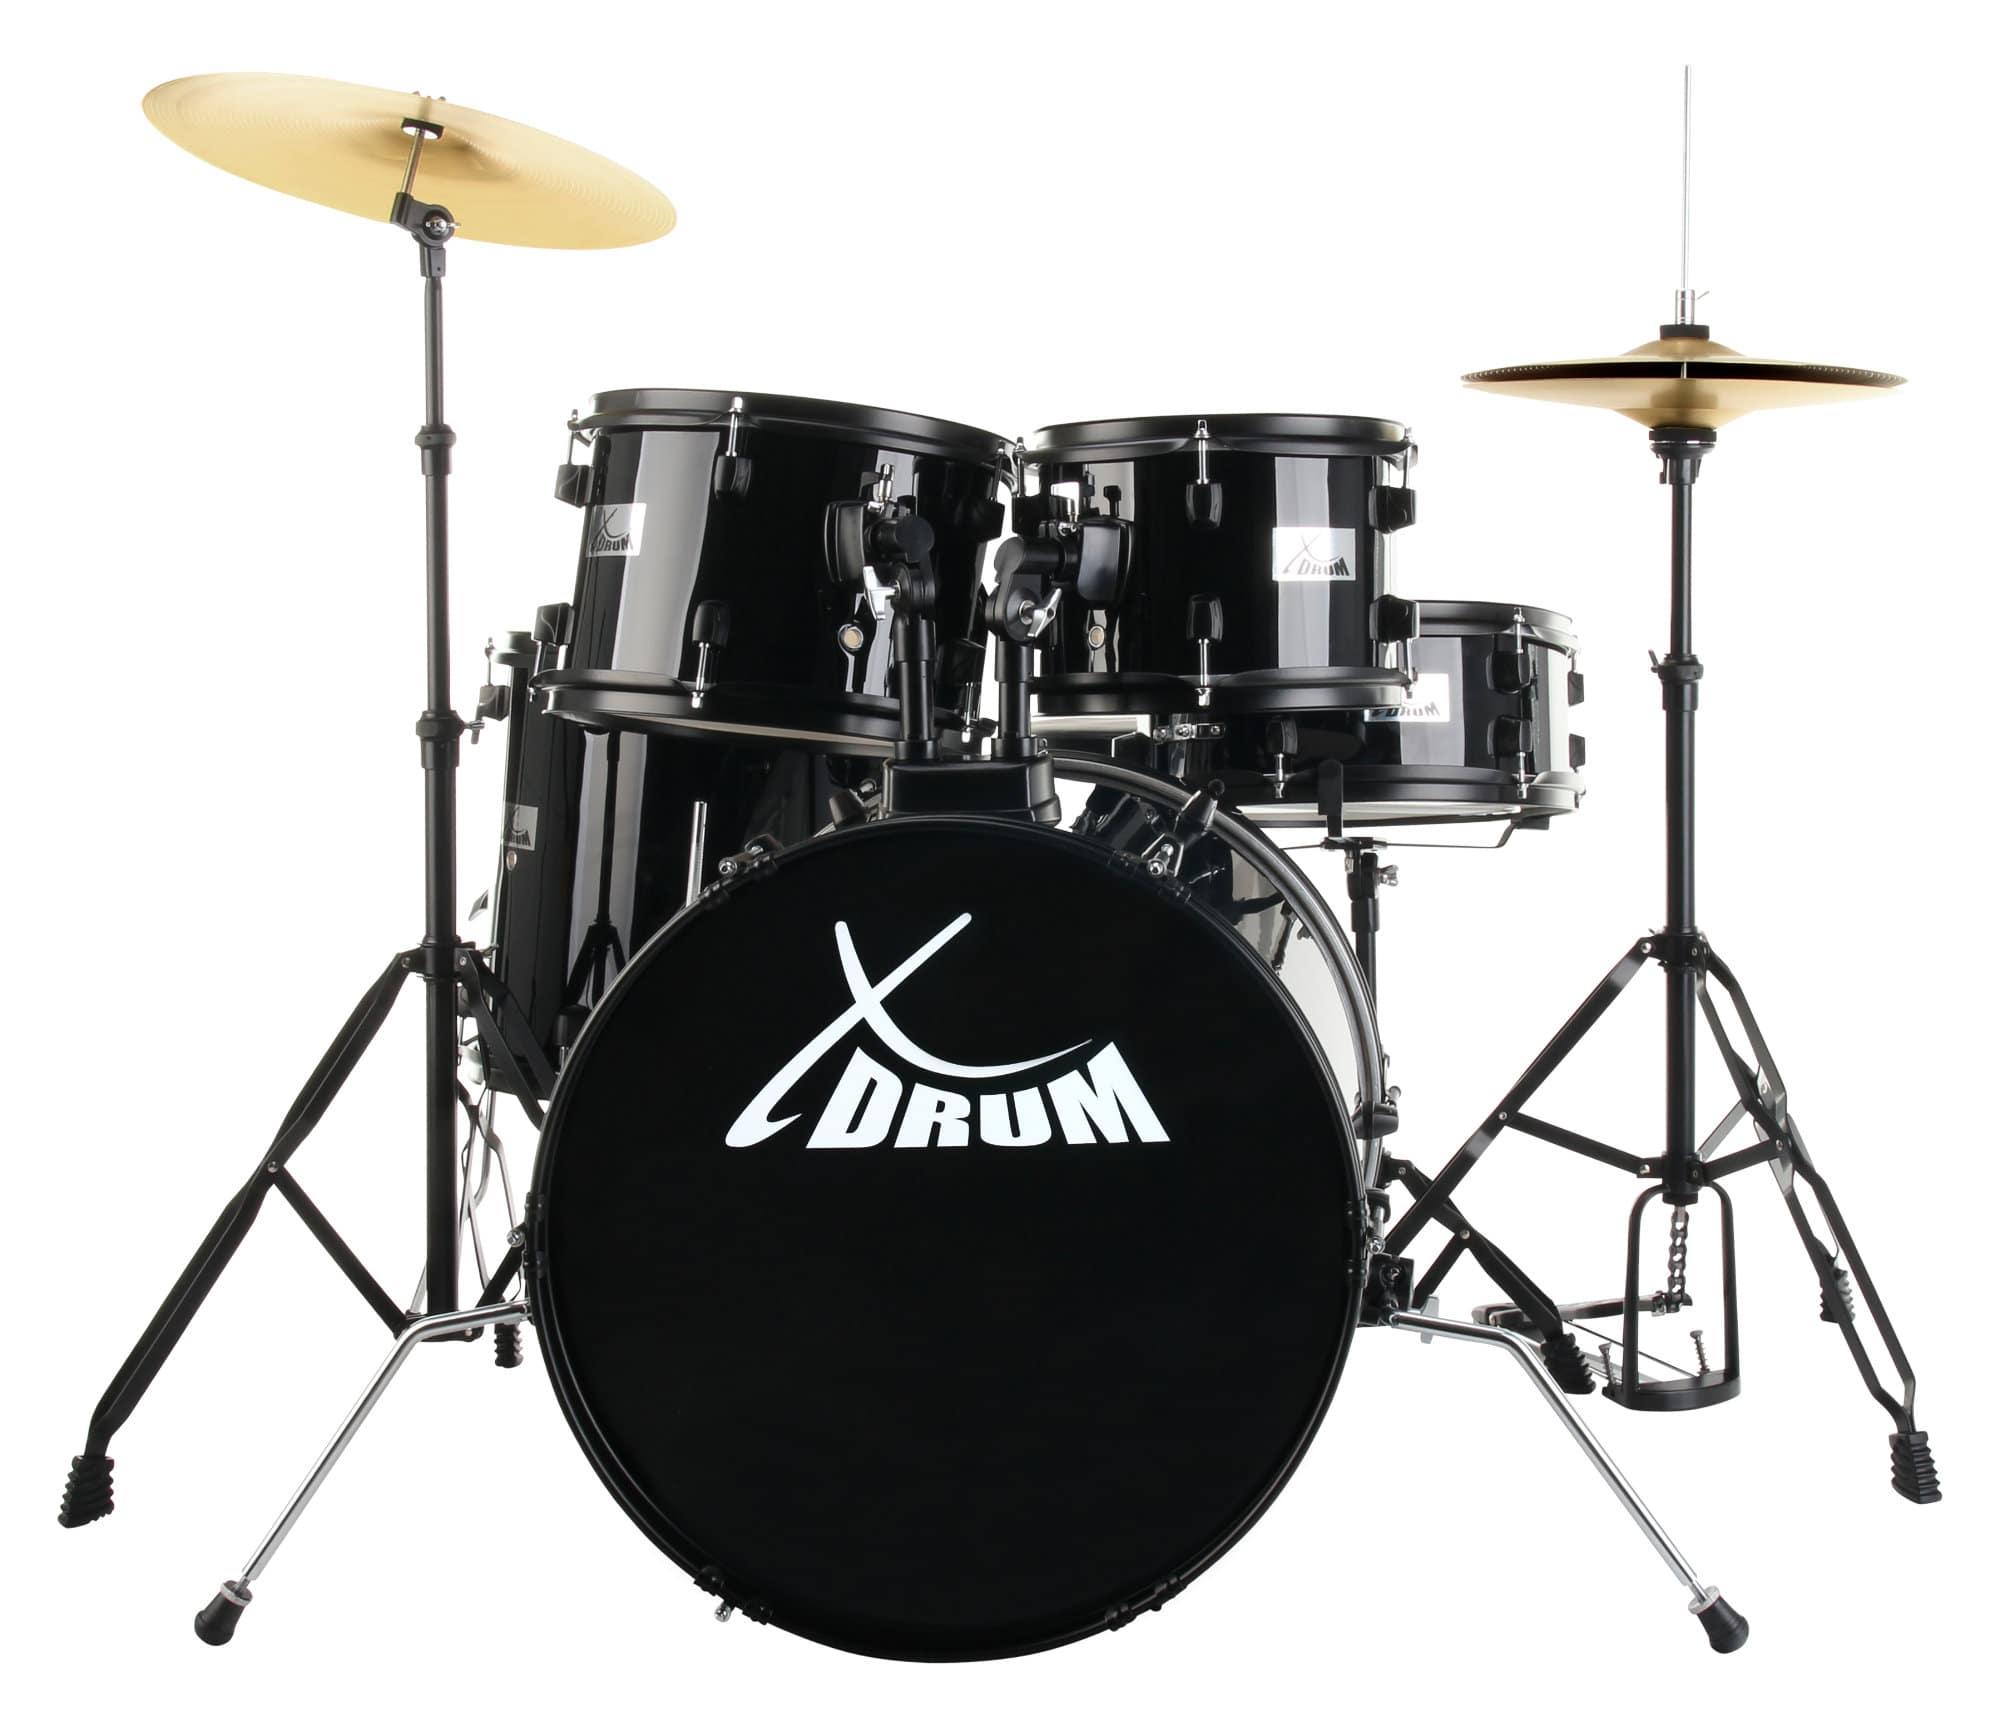 XDrum Rookie 20' Studio Schlagzeug Komplettset Black inkl. Schule DVD